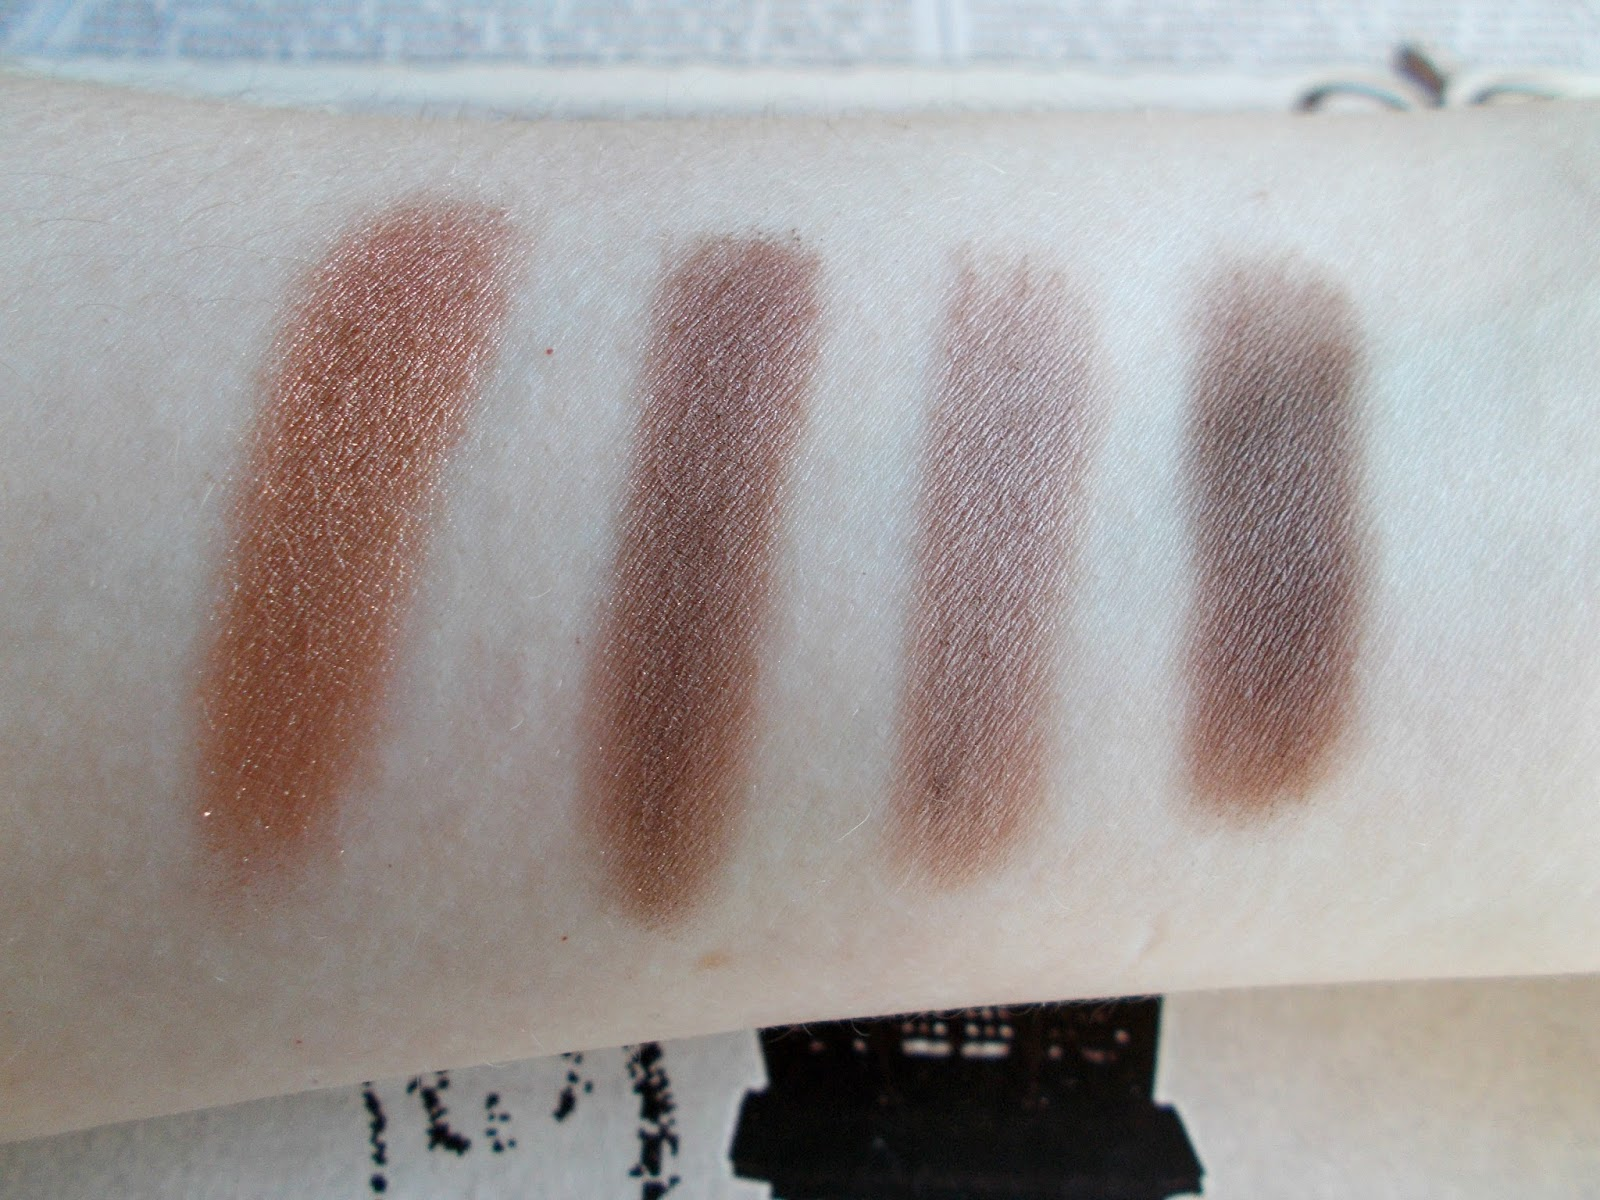 makeup geek eyeshadow swatches homecoming taupe notch barcelona beach mocha pans browns neurtrals